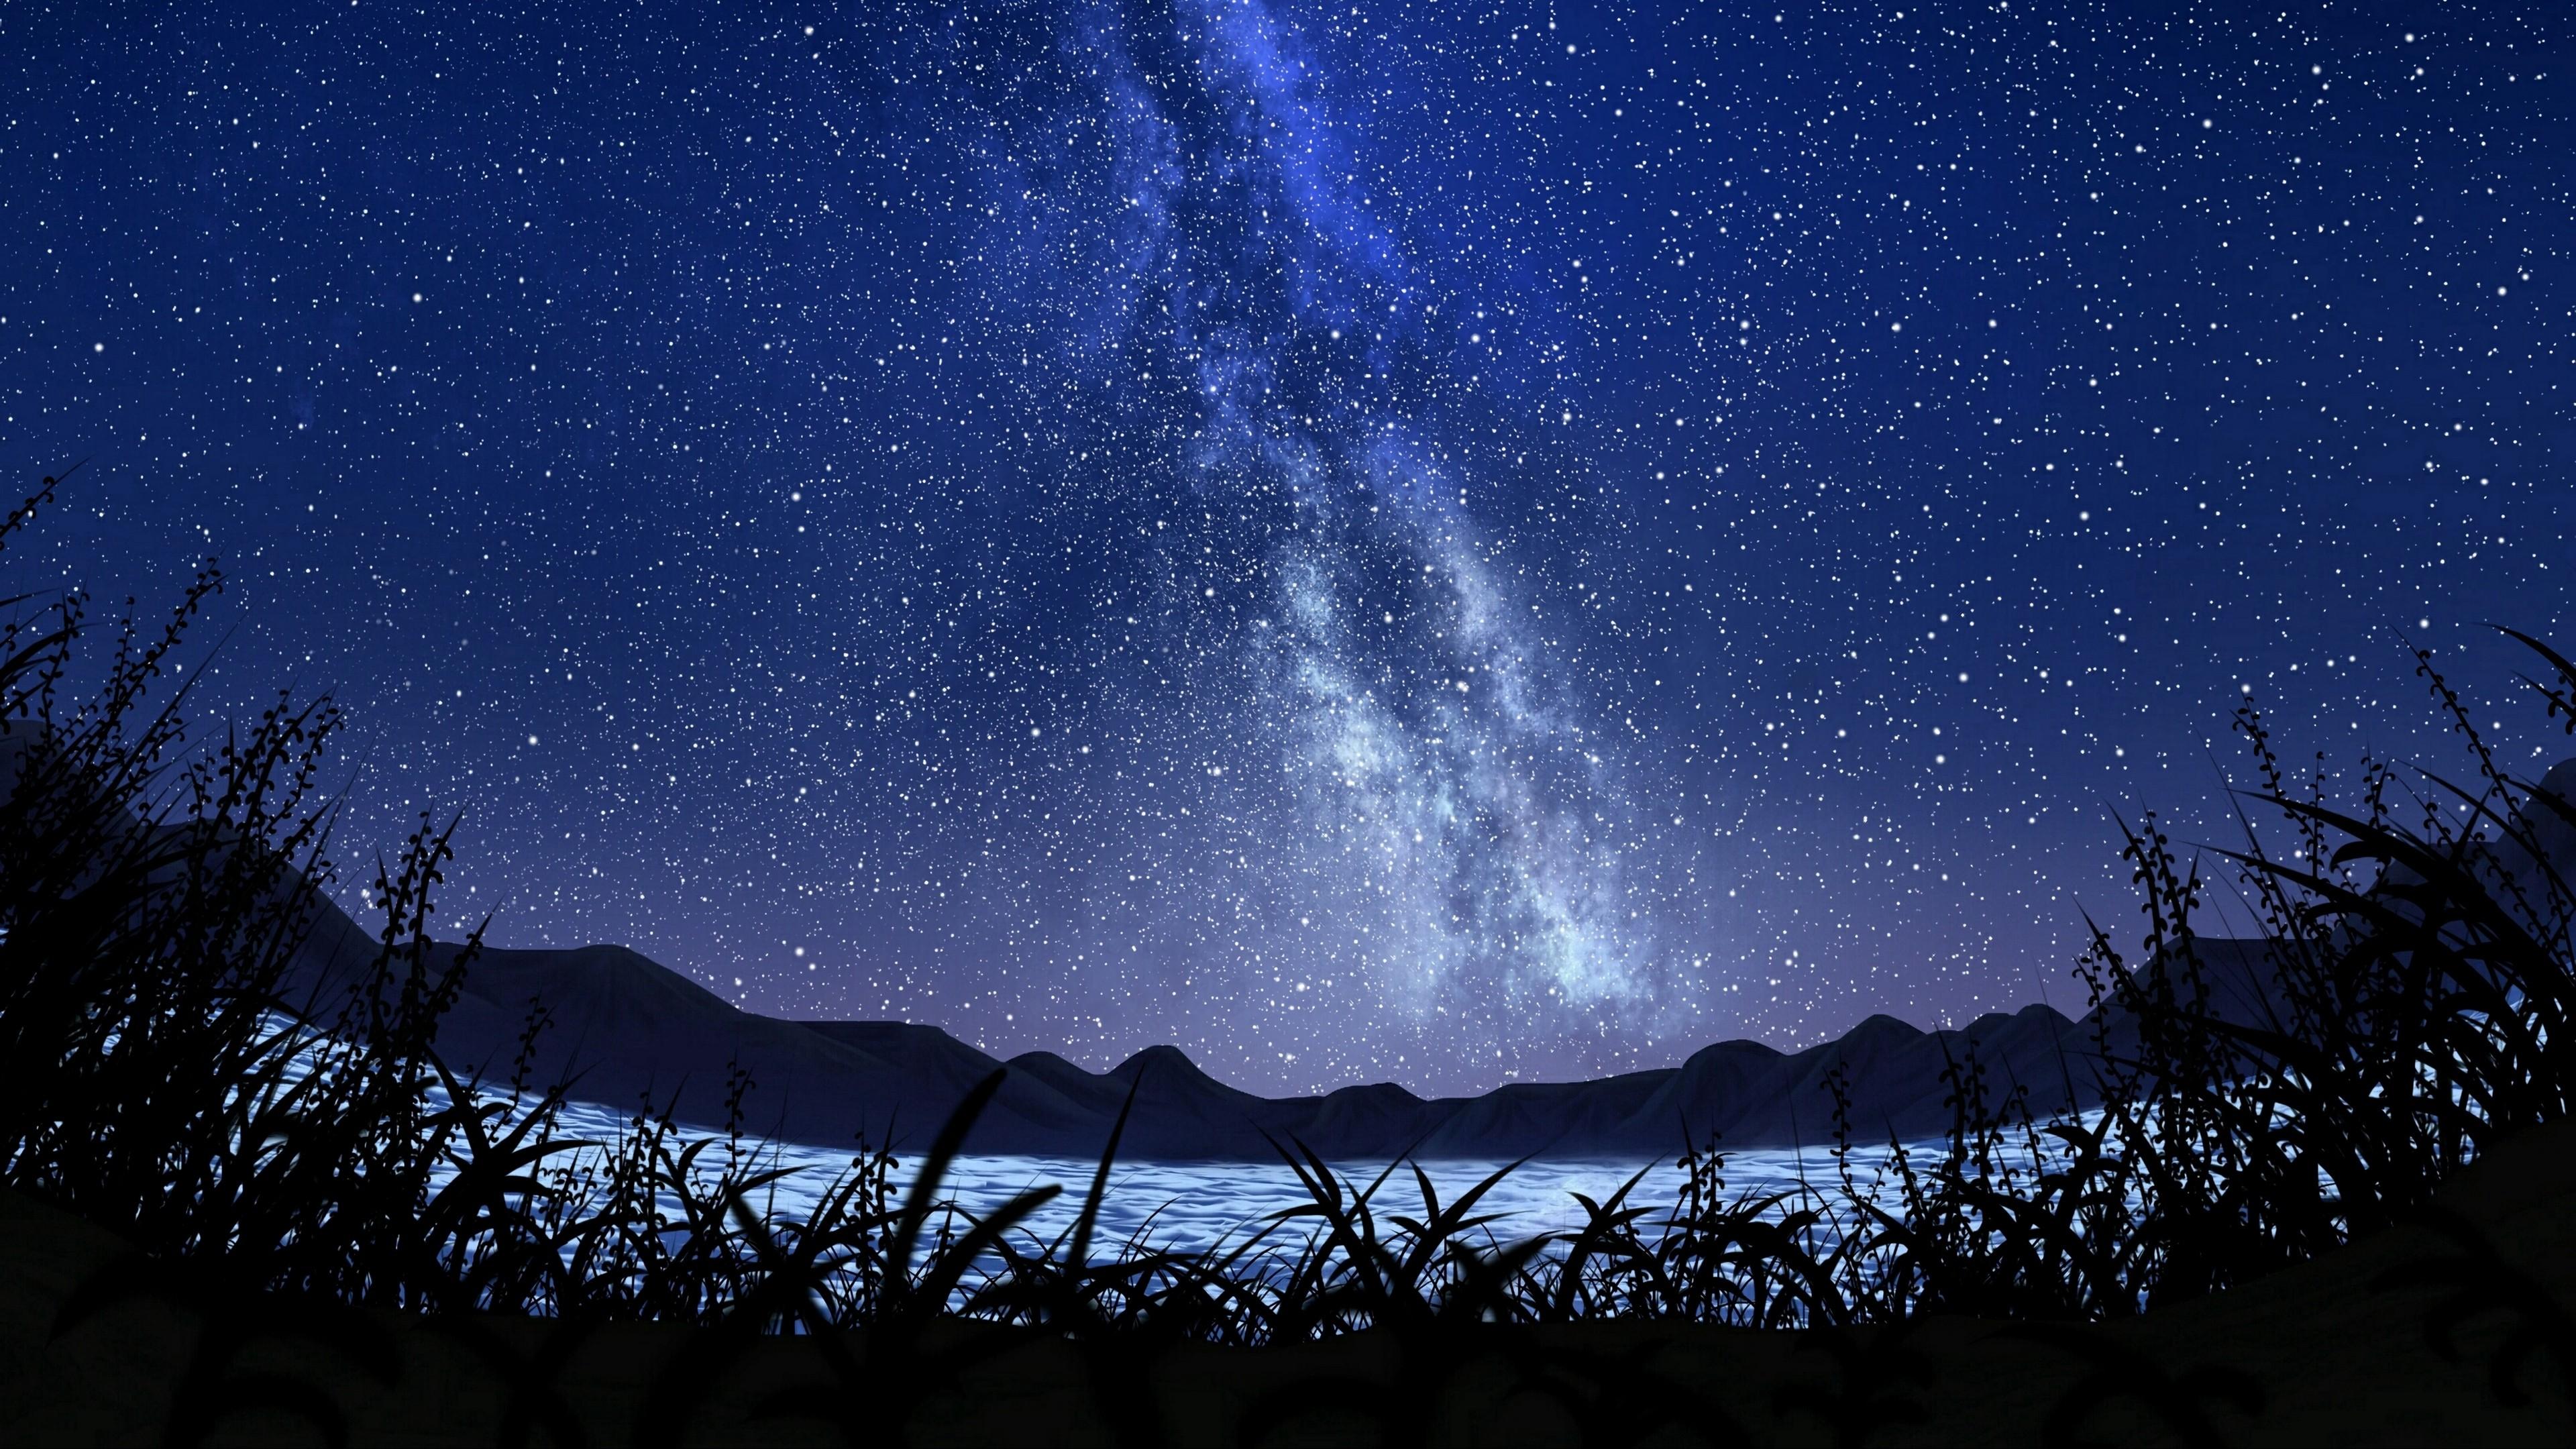 Anime Starry Night Sky Background 3840x2160 Wallpaper Teahub Io